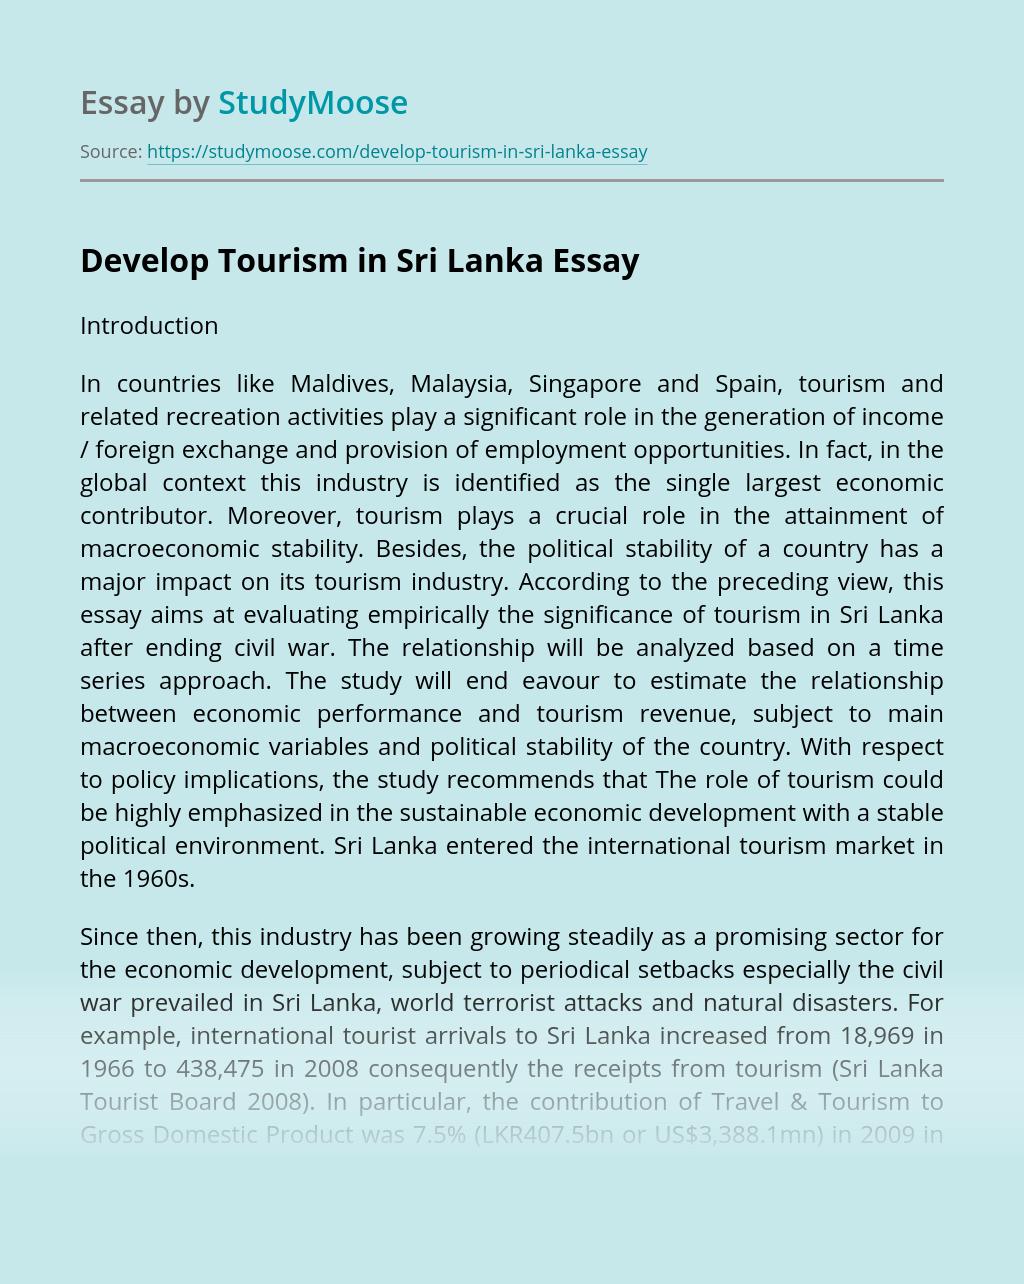 Develop Tourism in Sri Lanka